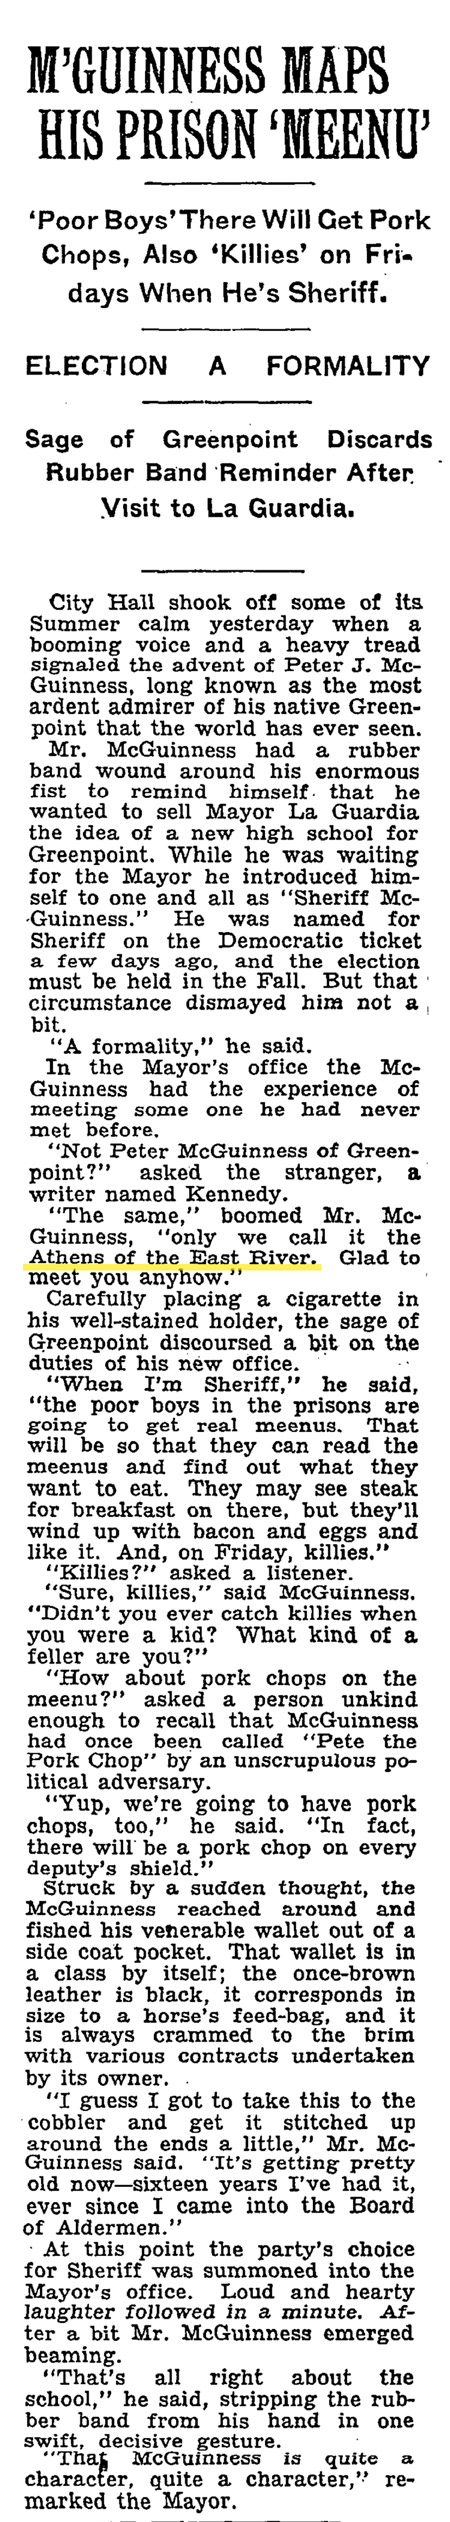 8/9/1935 New York Times